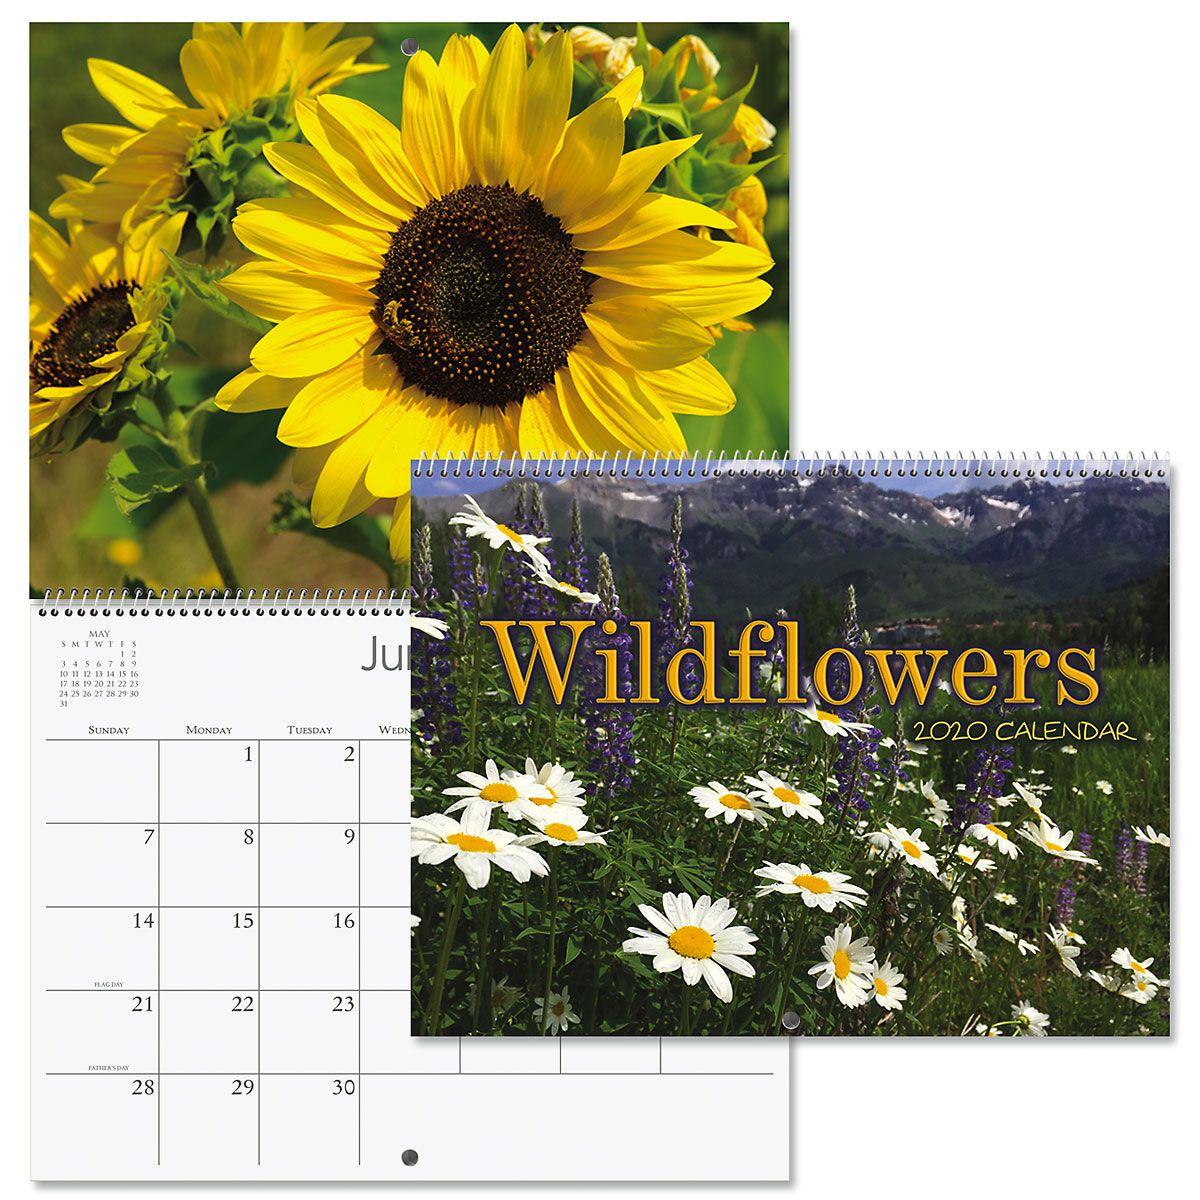 2020 Wildflowers Wall Calendar